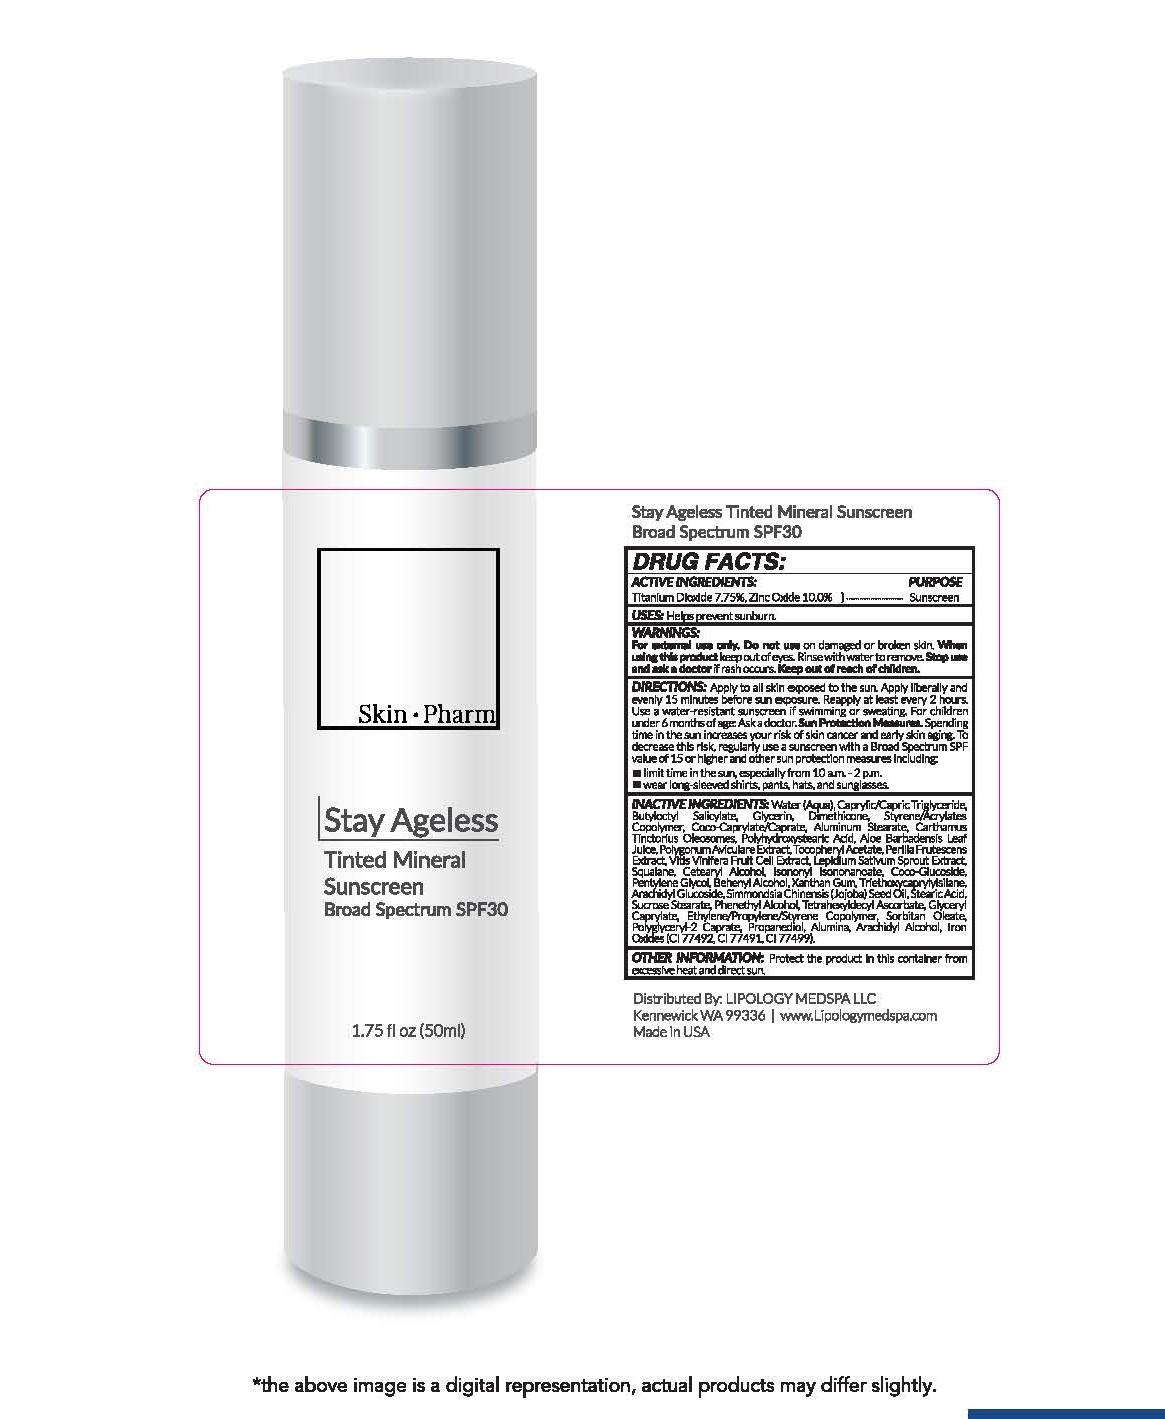 Skin Pharm Stay Ageless Tinted Mineral Sunscreen Broad Spectrum SPF 30 1.75 fl oz (50ml)